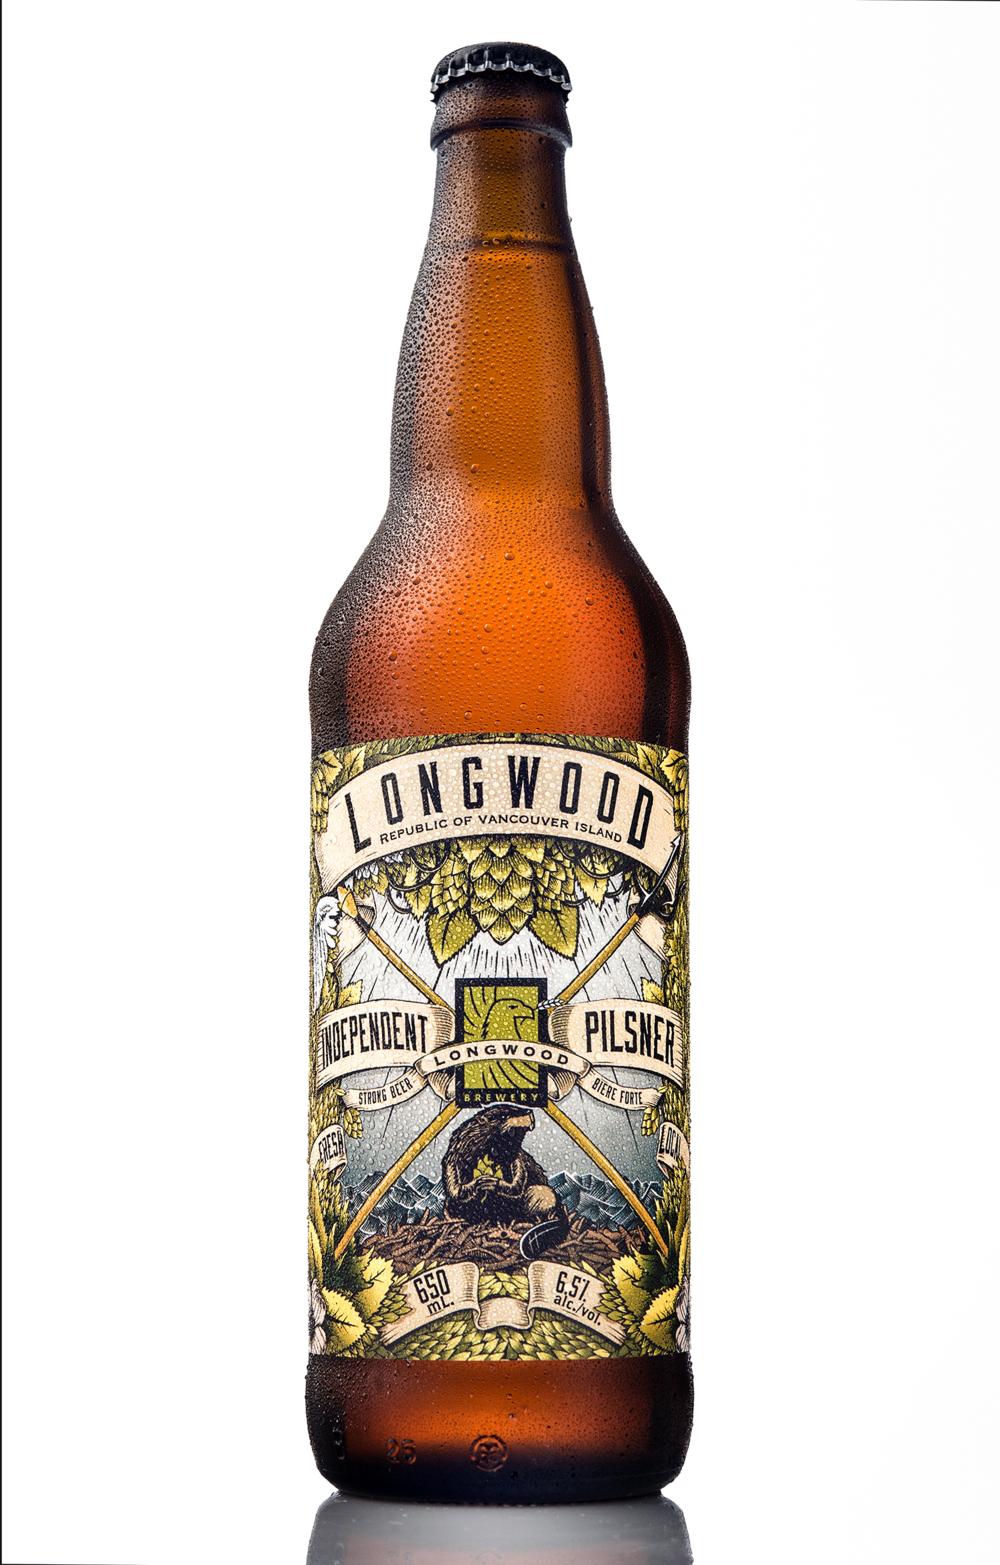 Packaging Design for Longwood Brewery's Independent Pilsner